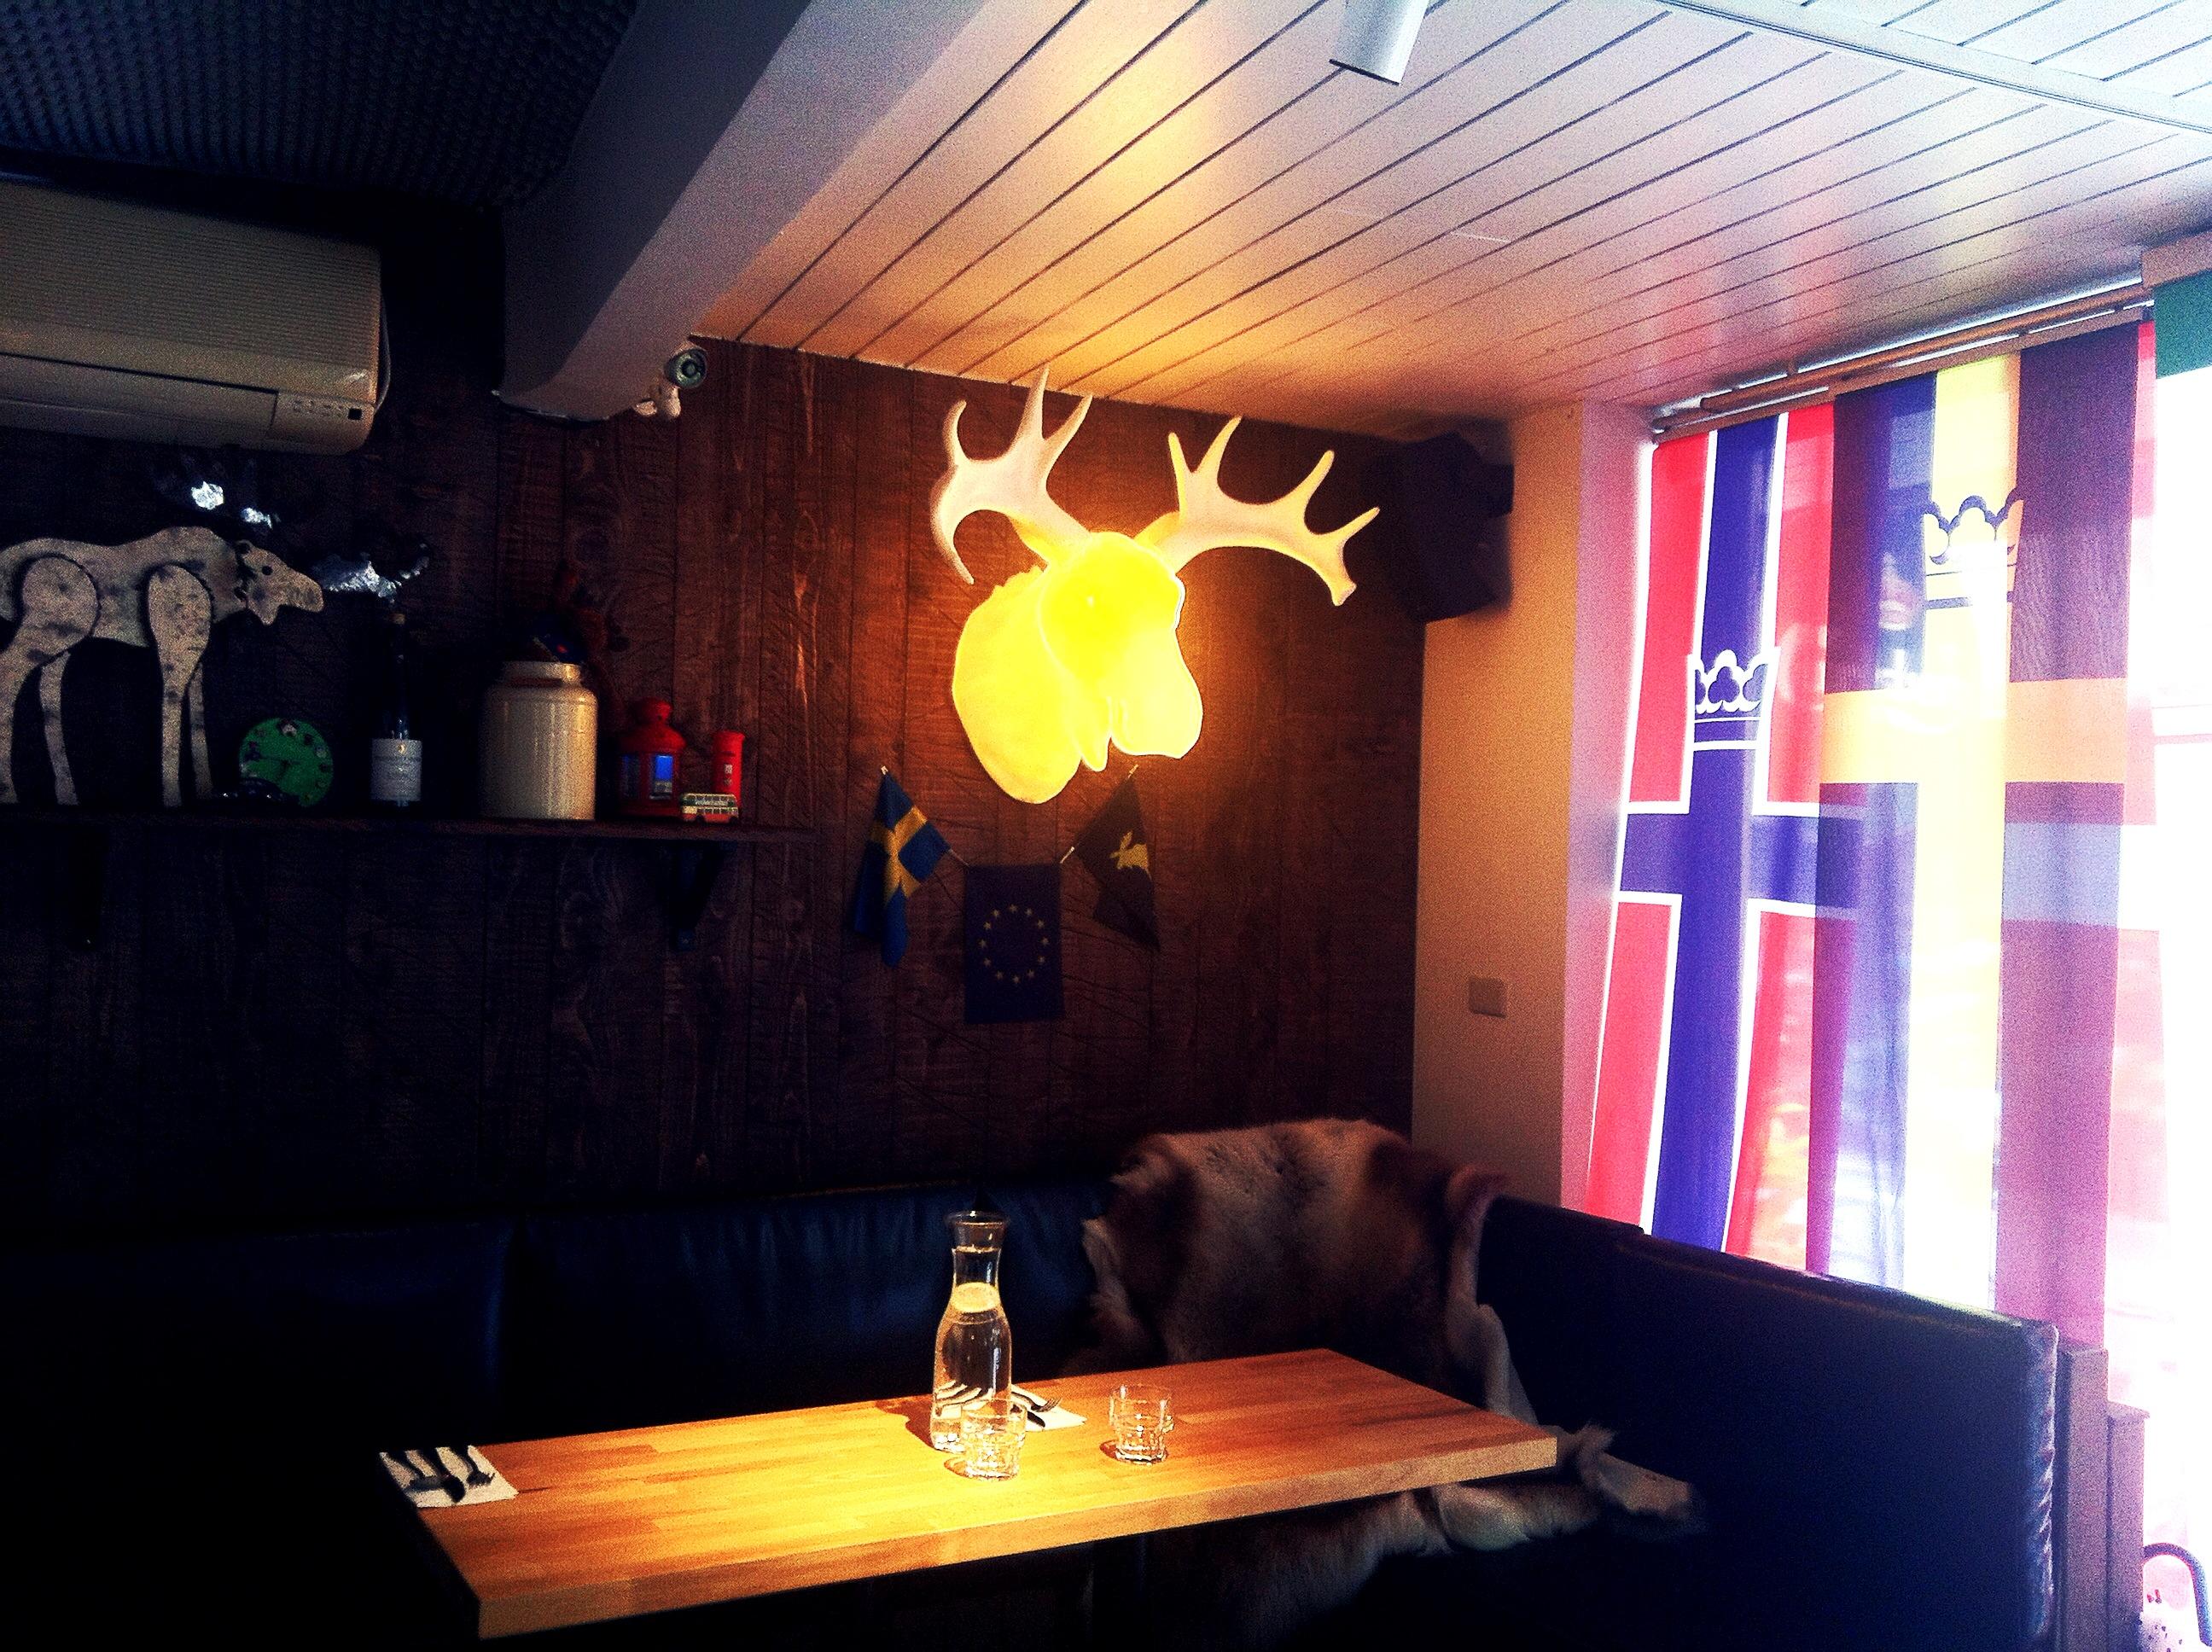 MILO MILO 迷路.麋鹿 瑞典小酒館